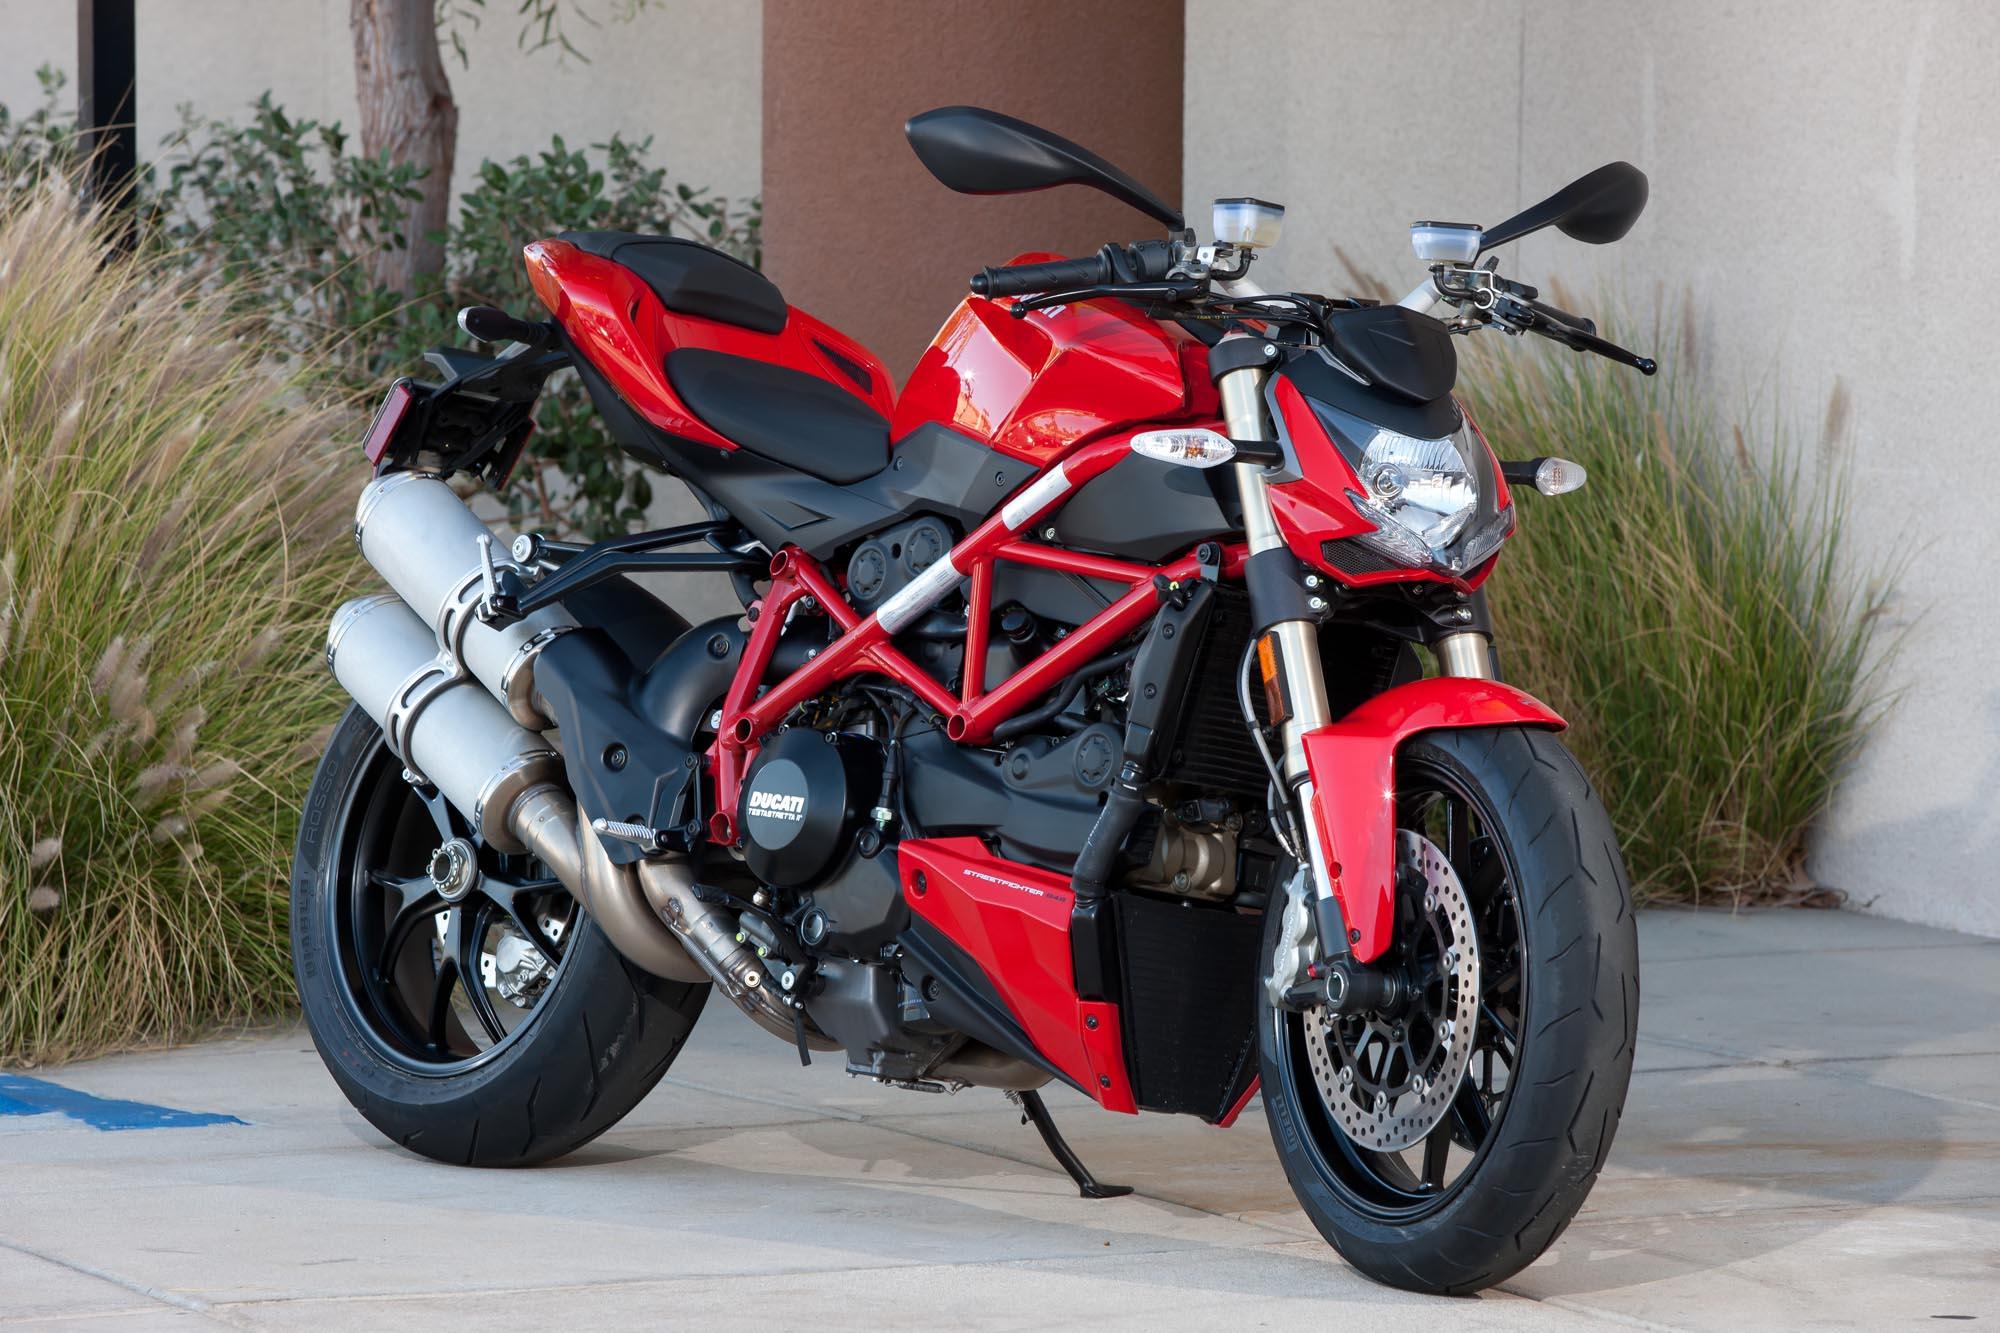 Ducati Streetfighter S Value